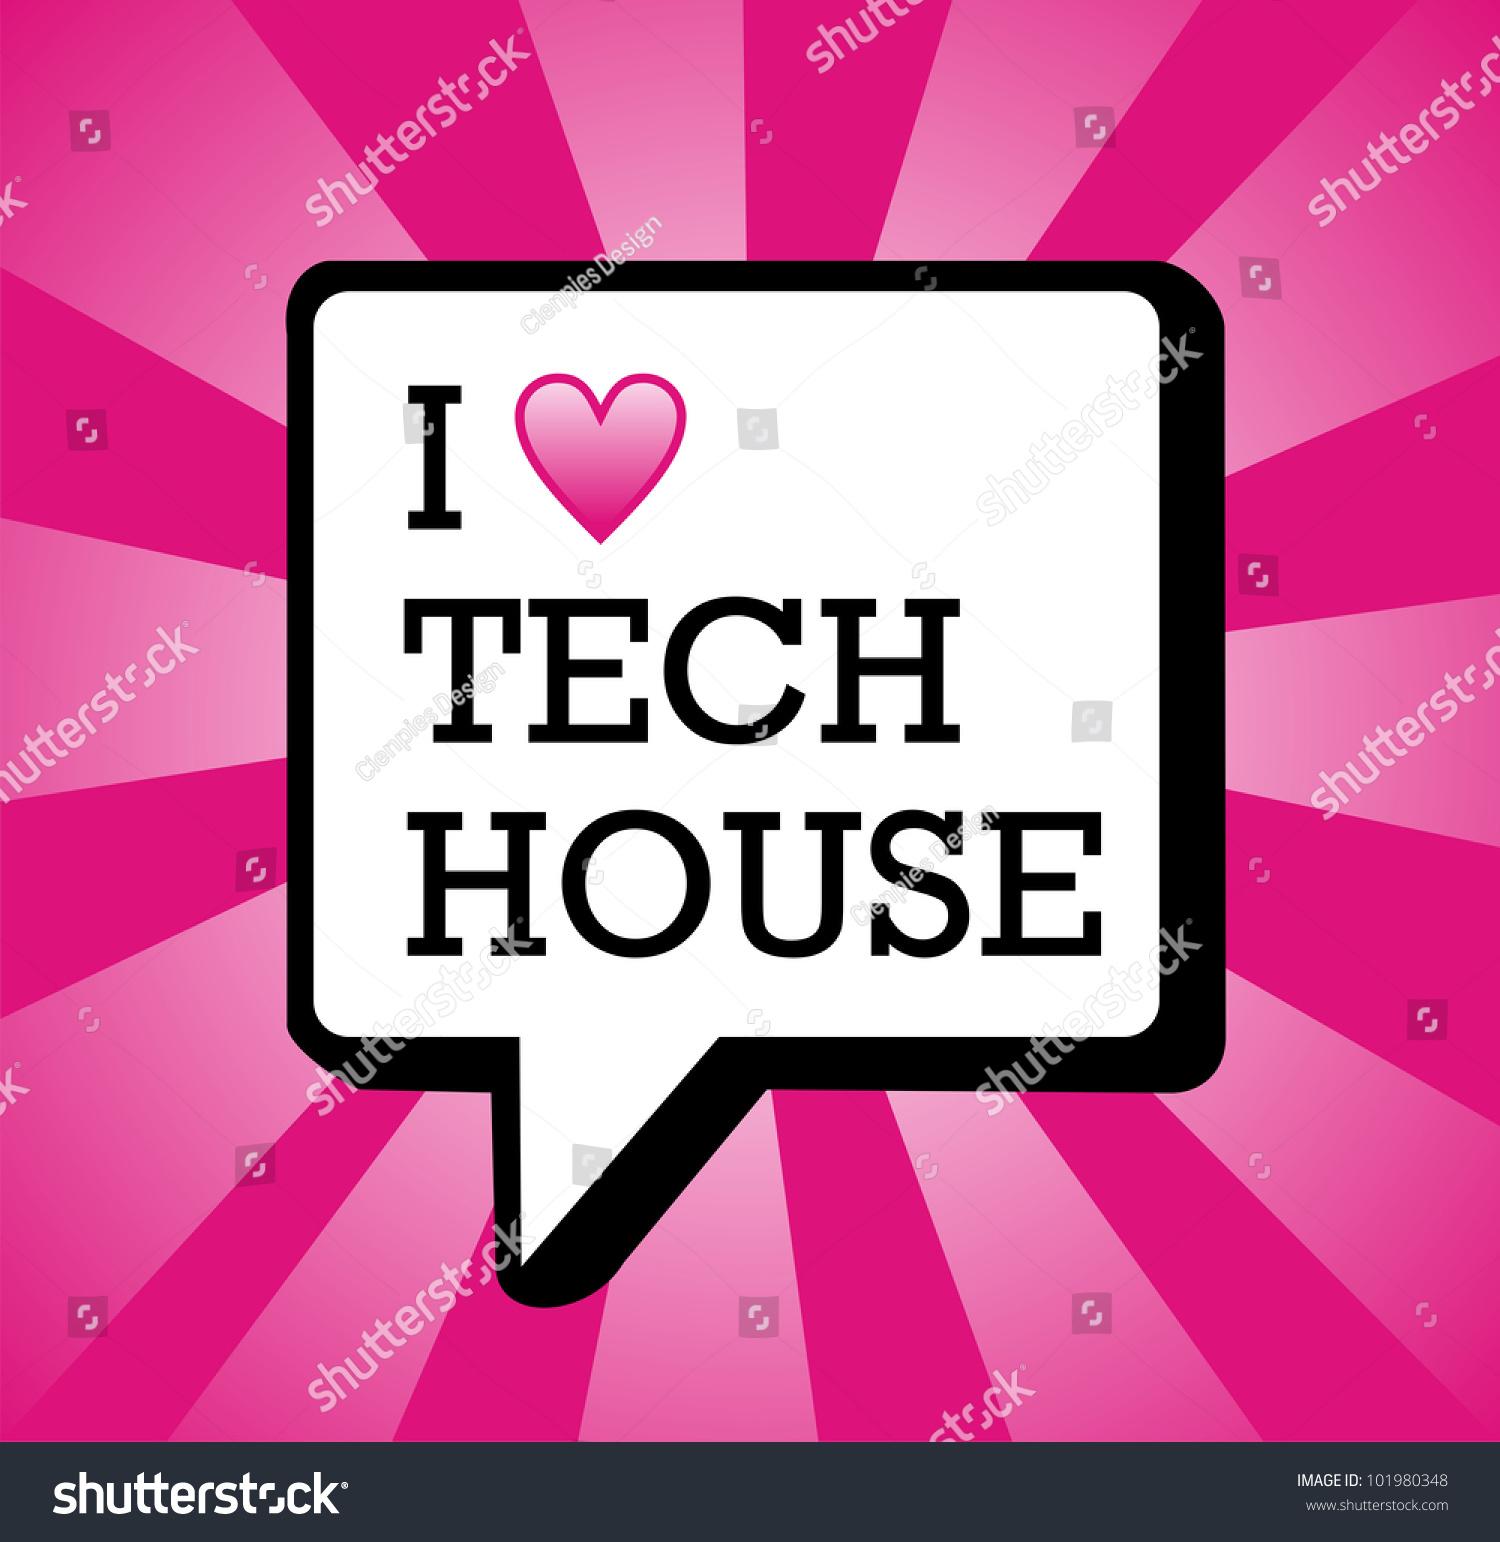 Love Tech House Text Communication Bubble Stock Vector 101980348 ...